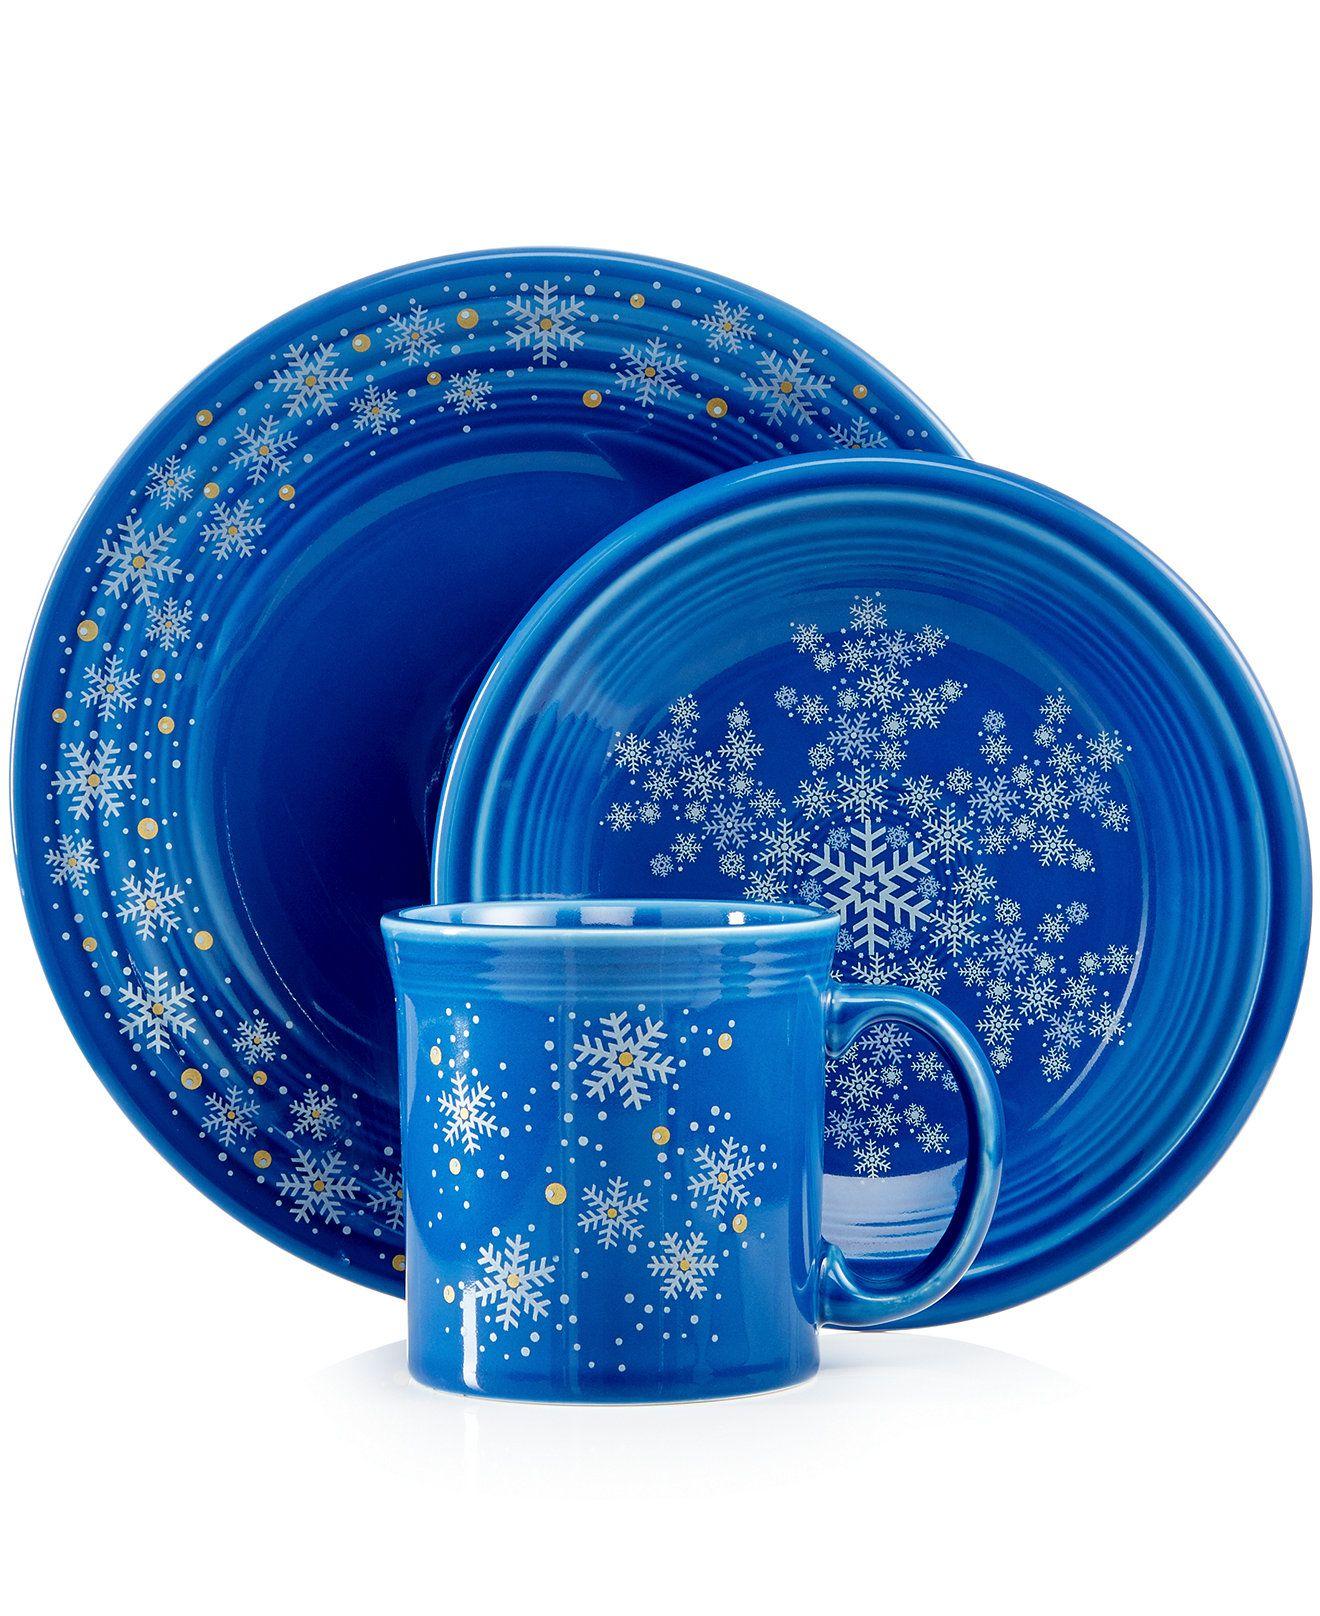 D❤️Fiesta Macy\u0027s Exclusive Snowflake Collection - Dinnerware - Dining \u0026 Entertaining - Macy\u0027s  sc 1 st  Pinterest & Fiesta Macy\u0027s Exclusive Snowflake Collection - Fiesta - Dining ...